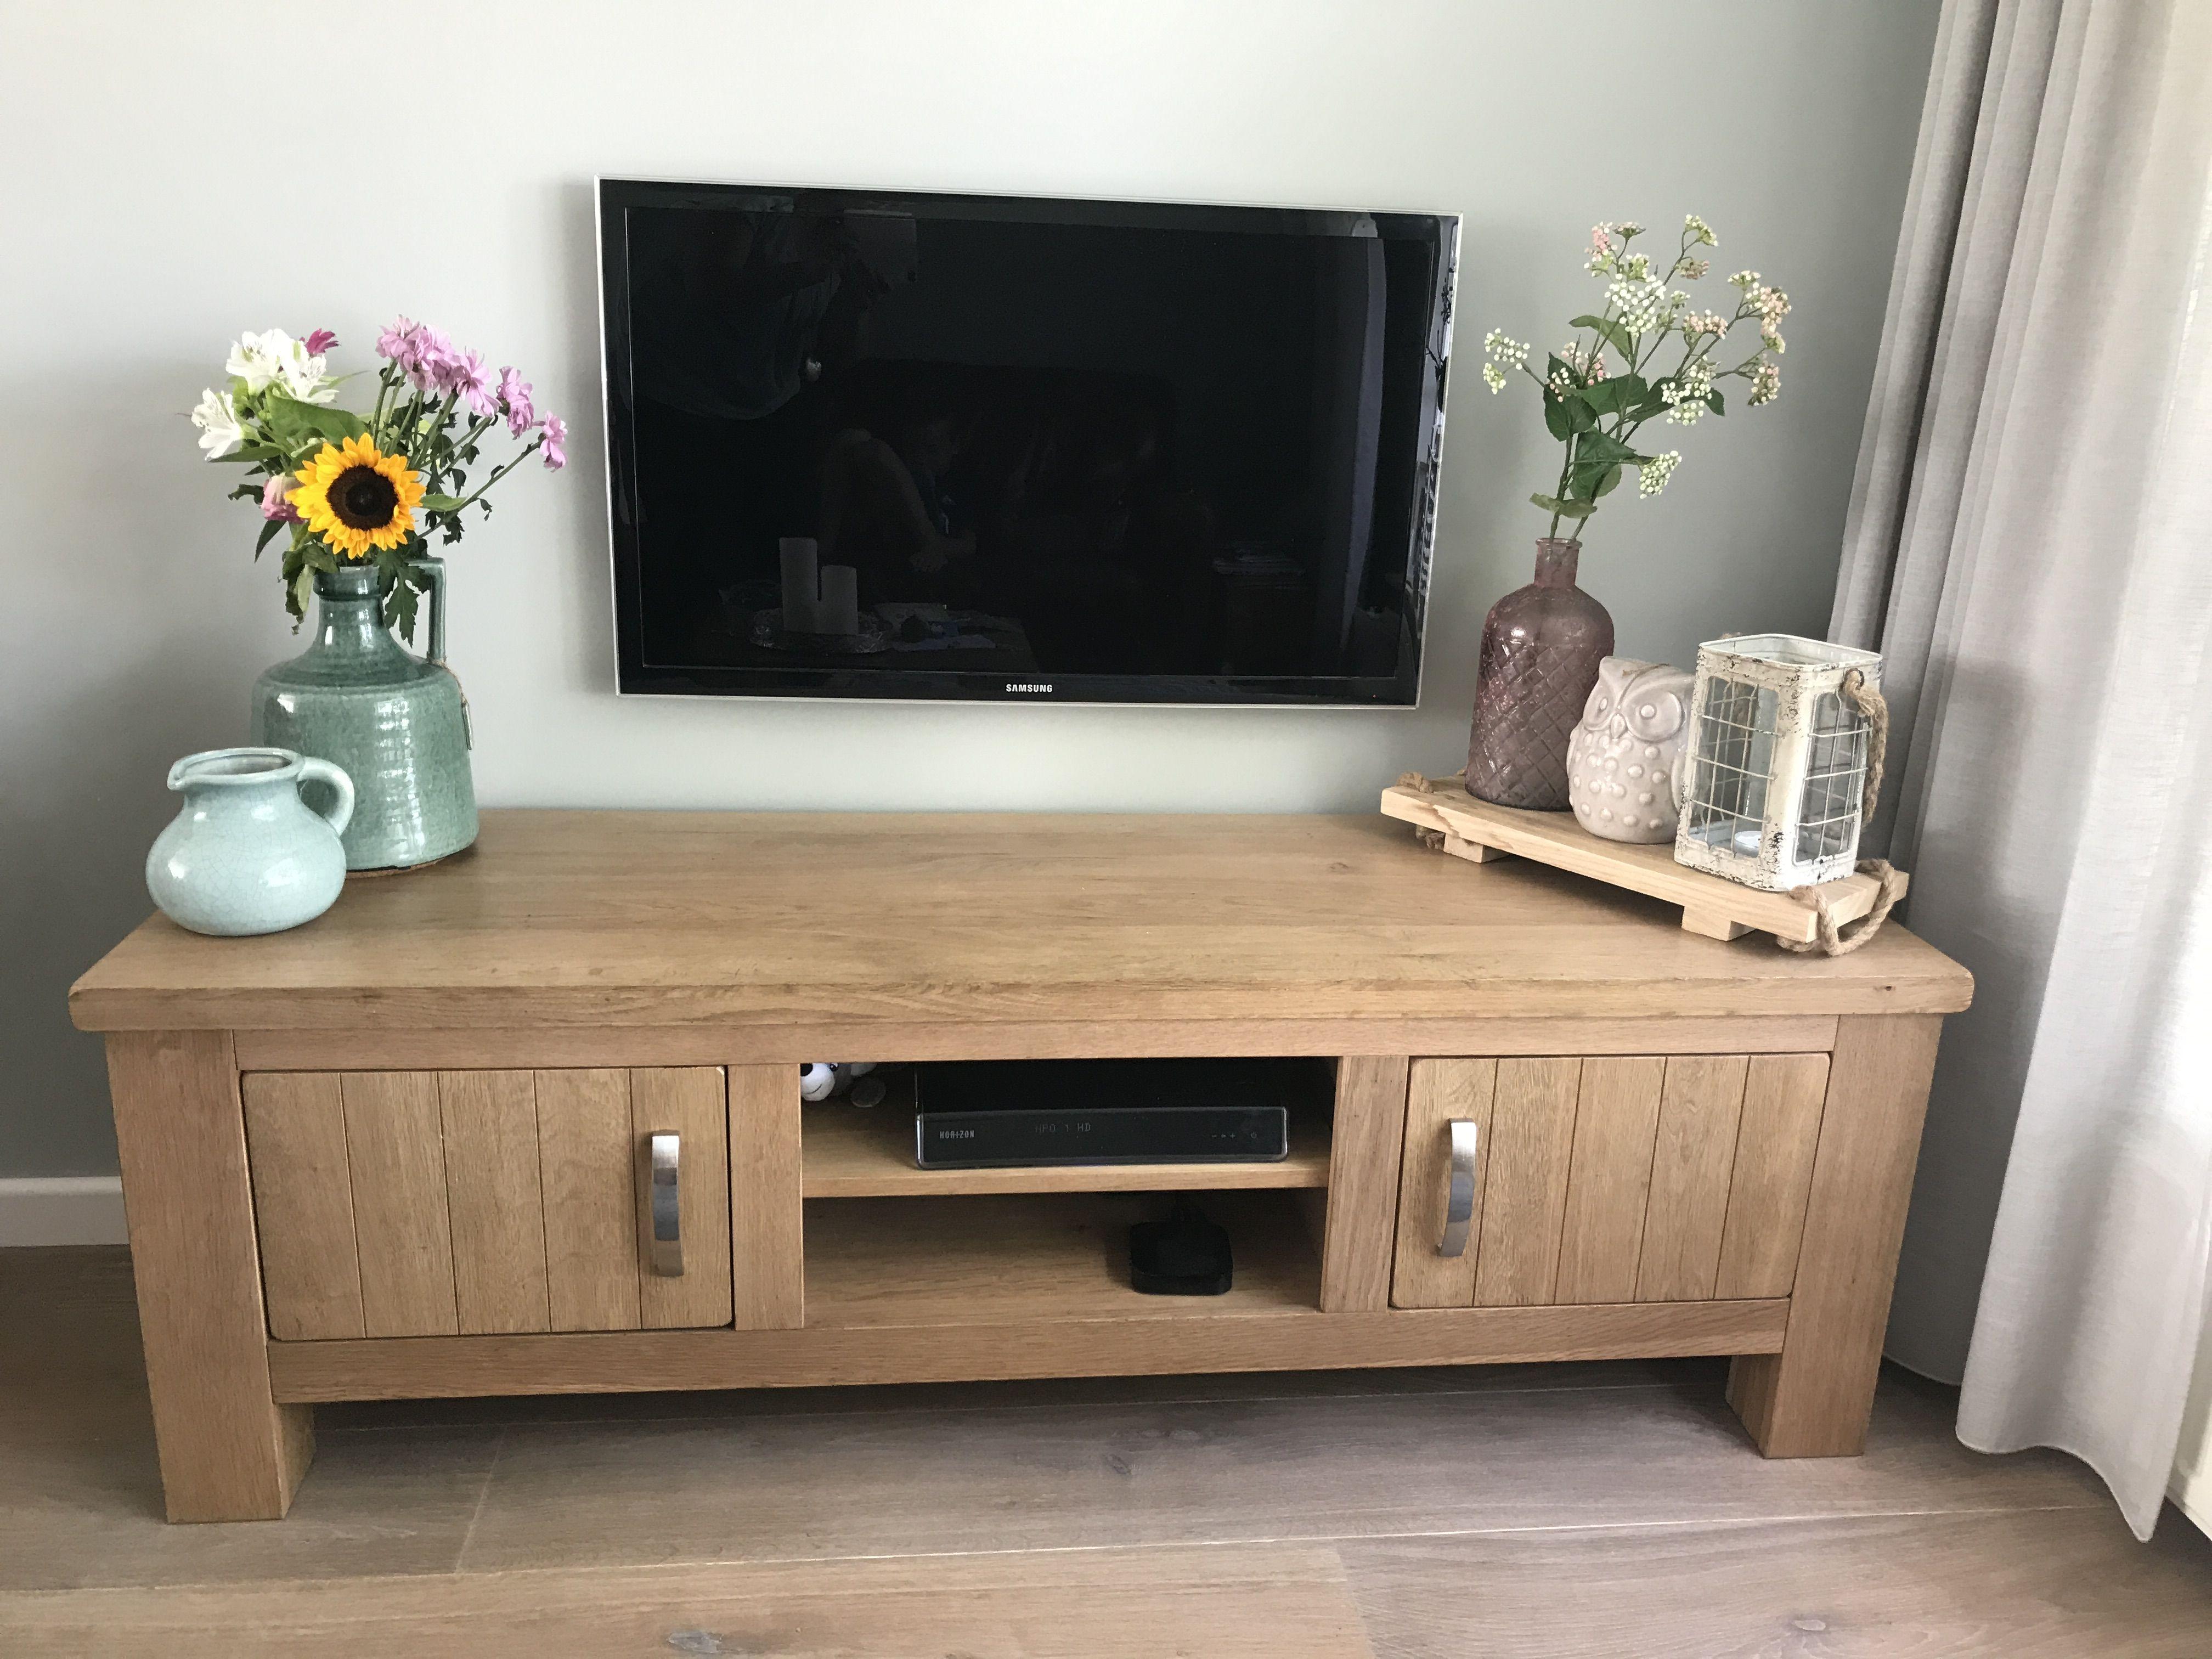 Gerookt Eiken Meubels : Woonkamer televisie aan de muur tv meubel gerookt eiken wand f b